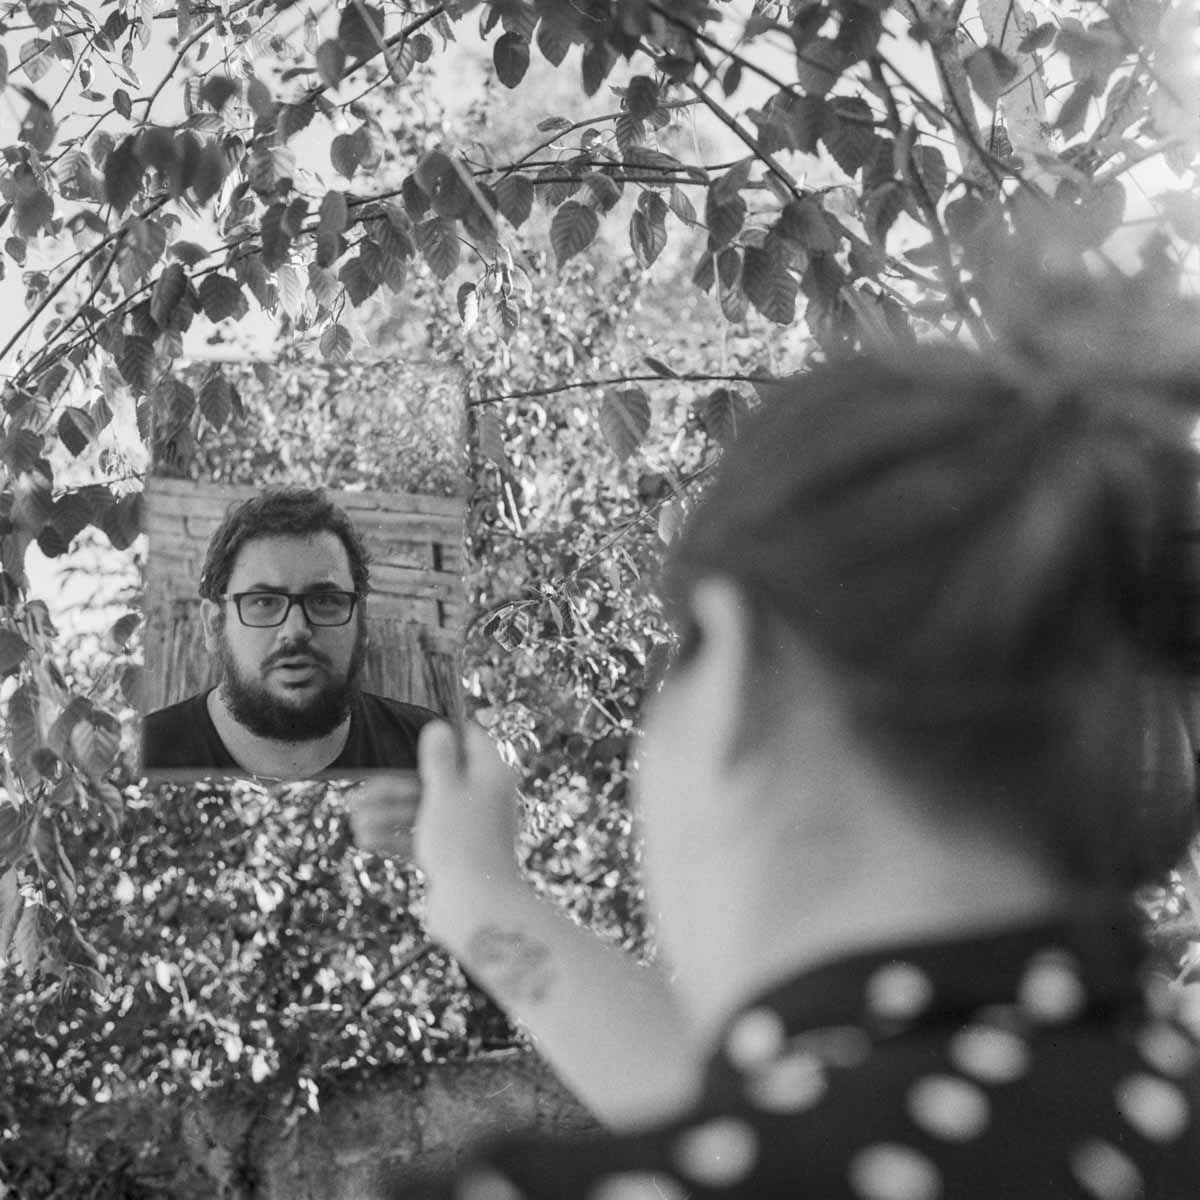 Philippe Lafaye, Atelier Focale 16 concours mensuel juin 2020, autoportrait